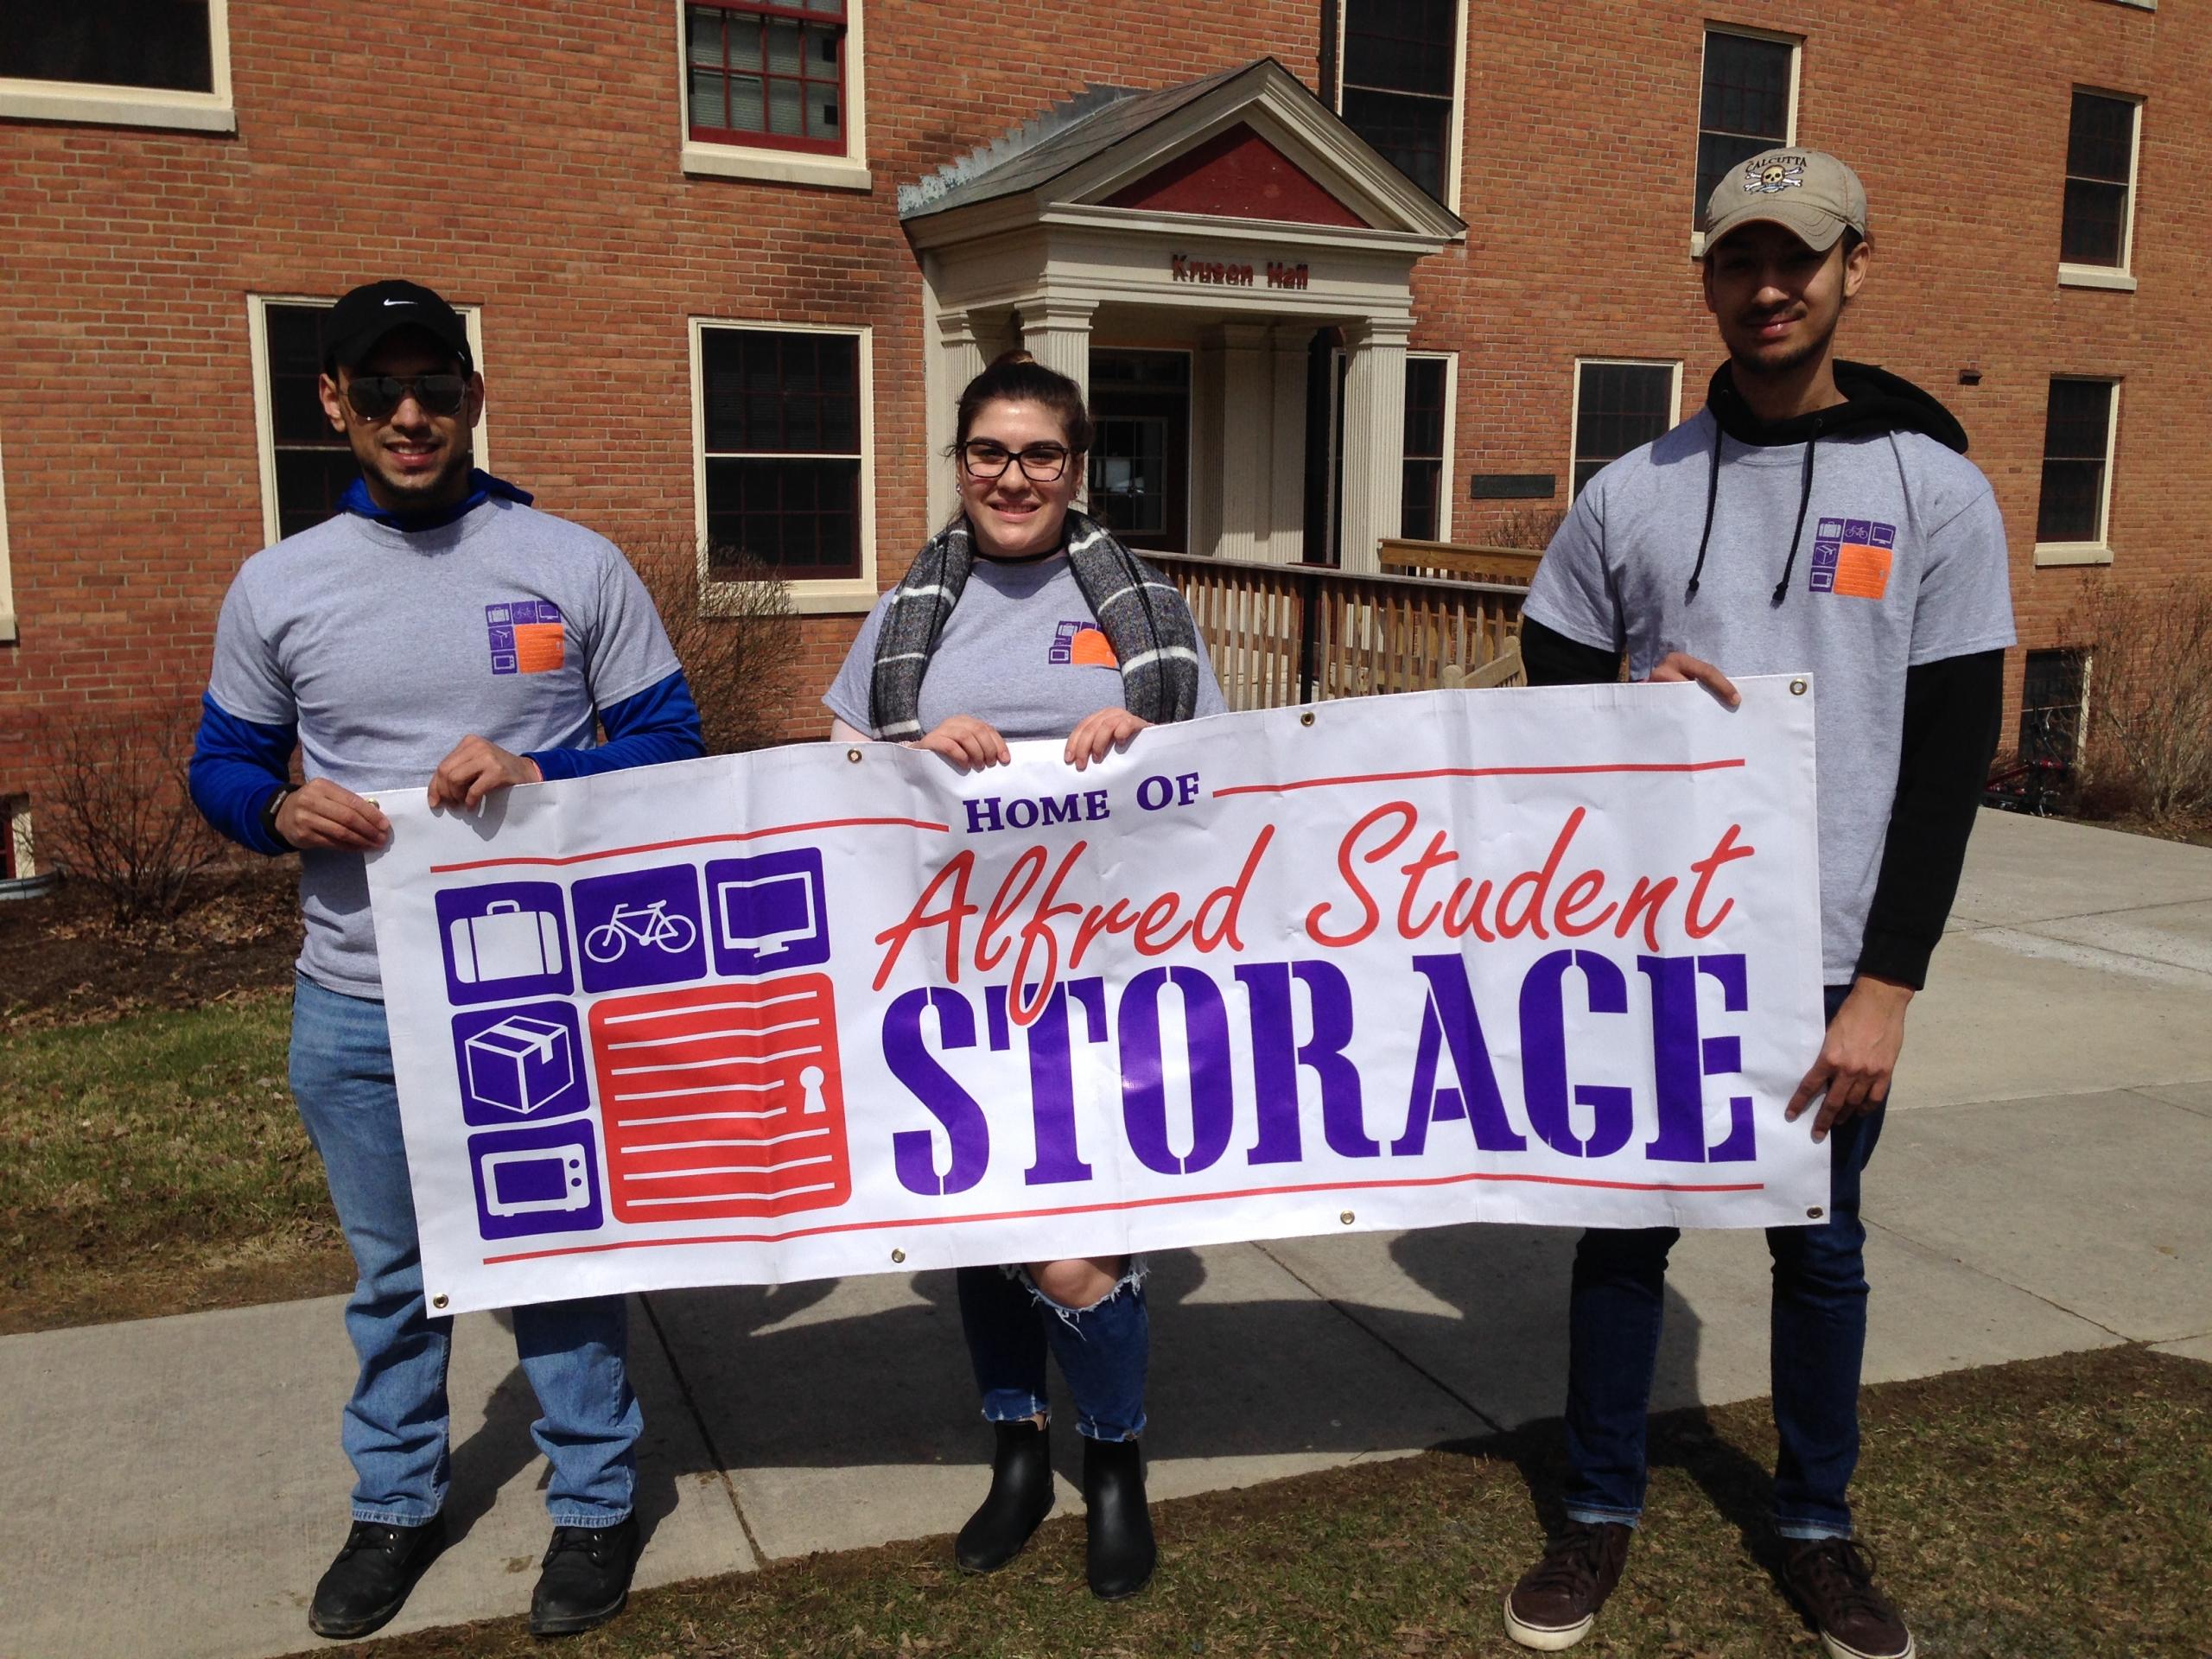 Alfred Student Storage Banner